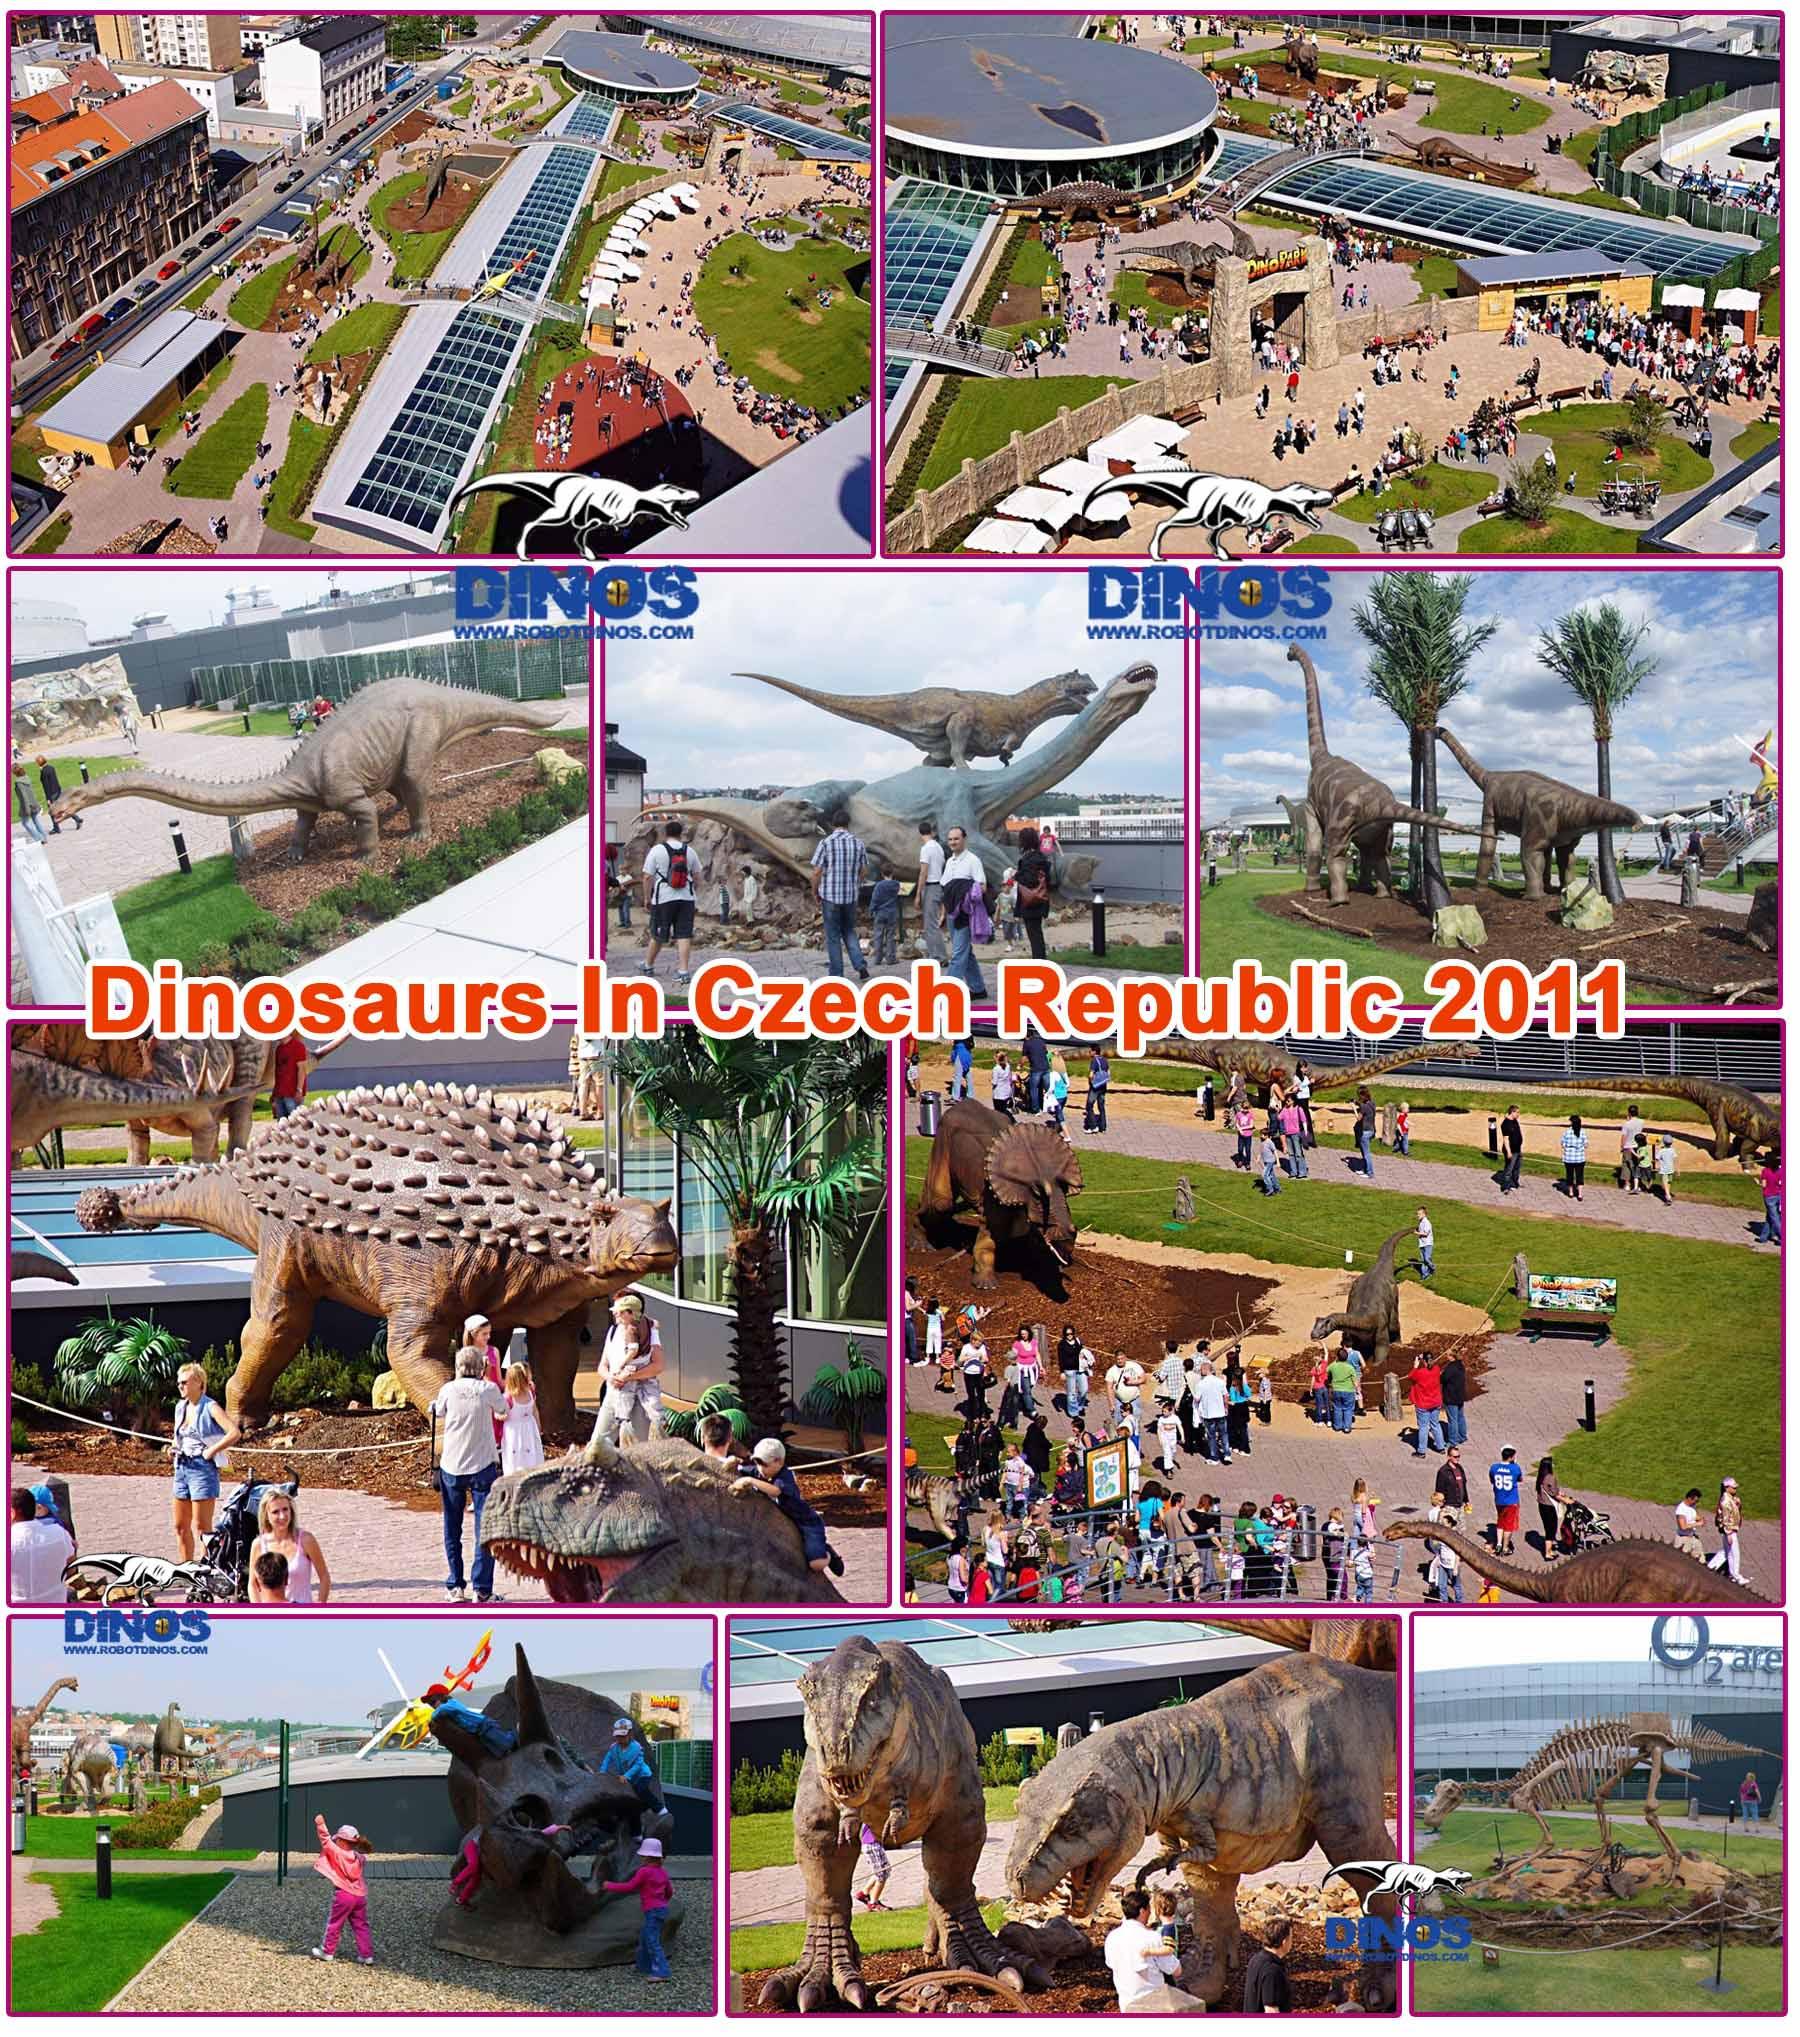 animatronic dinosaur,robotic dinosaur,robot dinosaurs